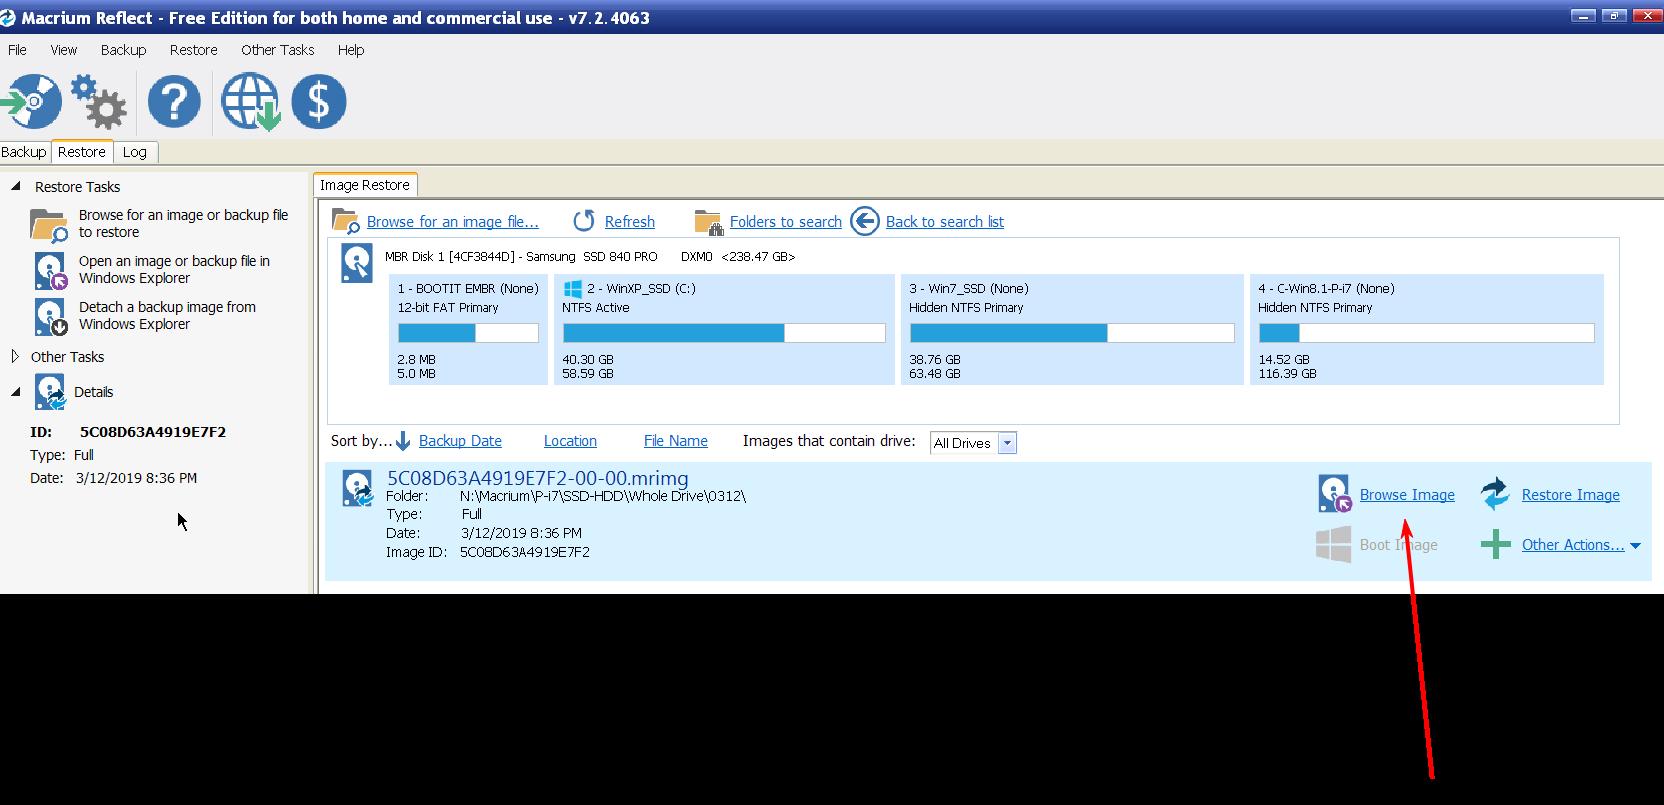 Backup-Image-File-Selected